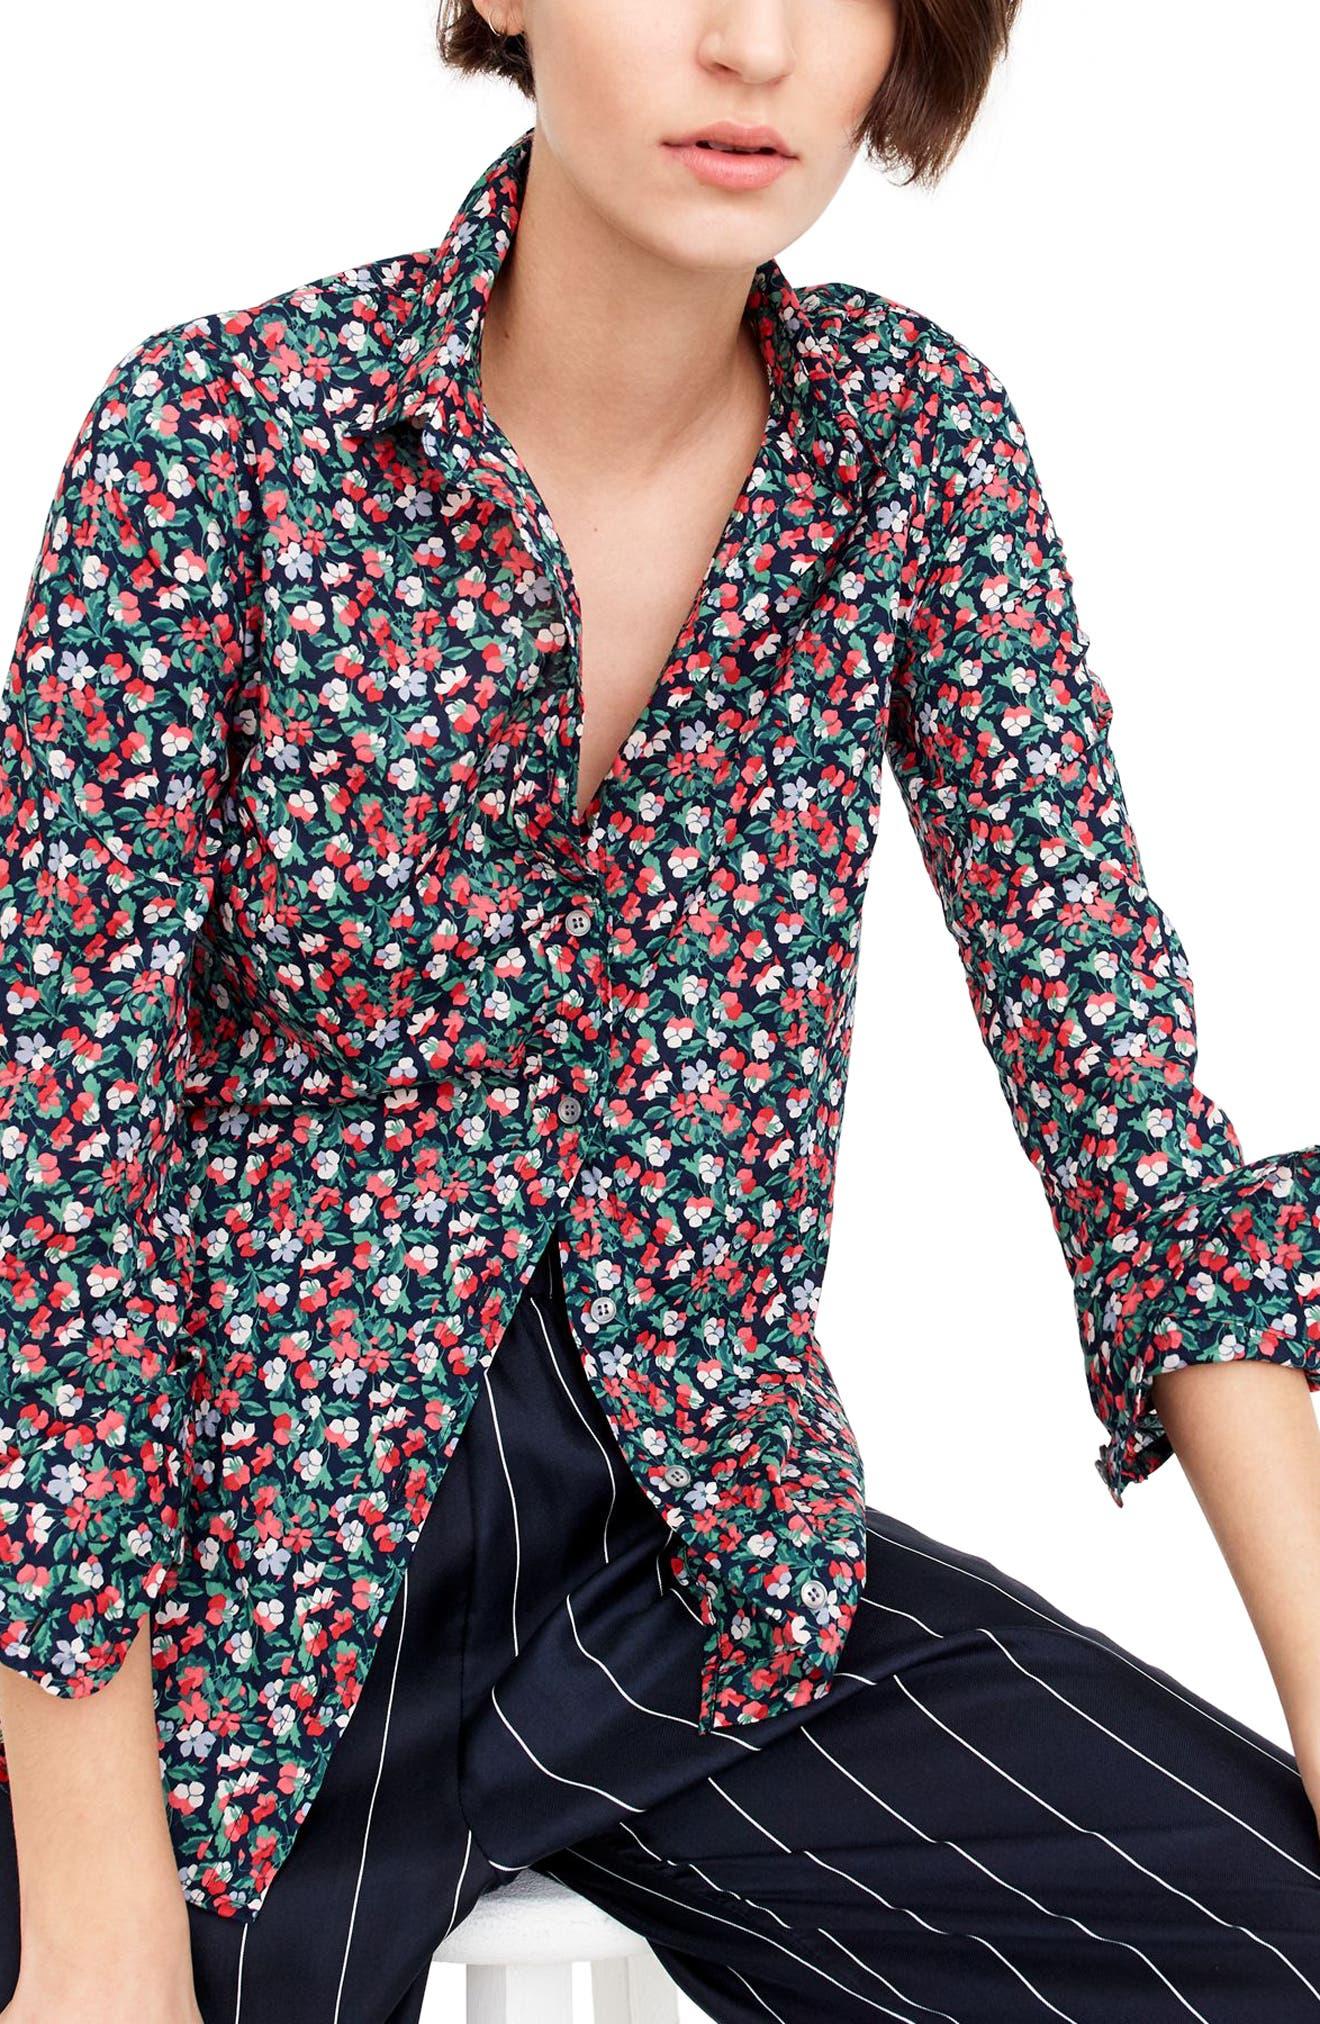 Sarah Liberty Perfect Shirt,                             Main thumbnail 1, color,                             400